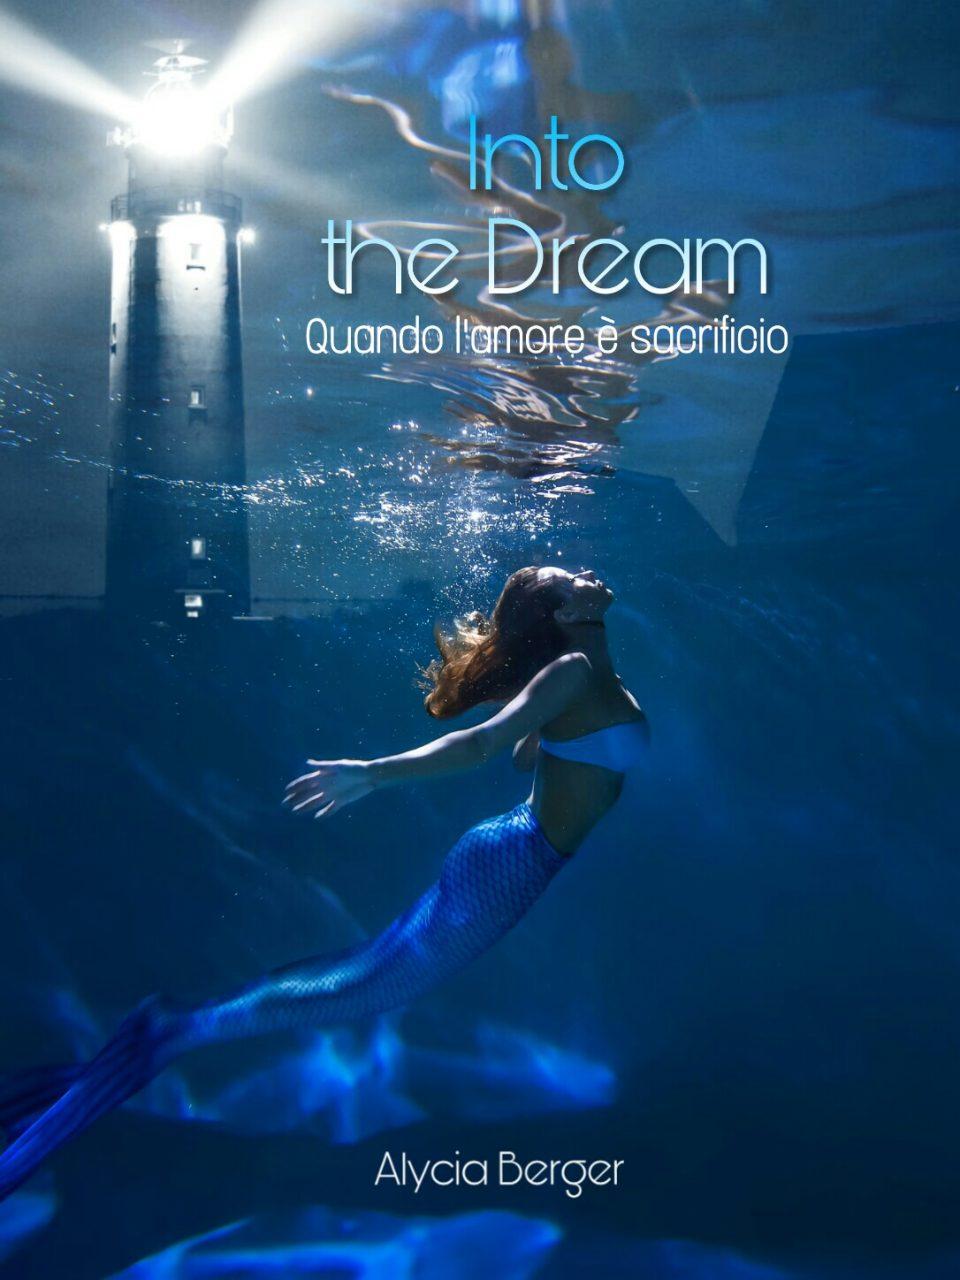 Alycia Berger Into the dream - Quando l'amore è sacrificio